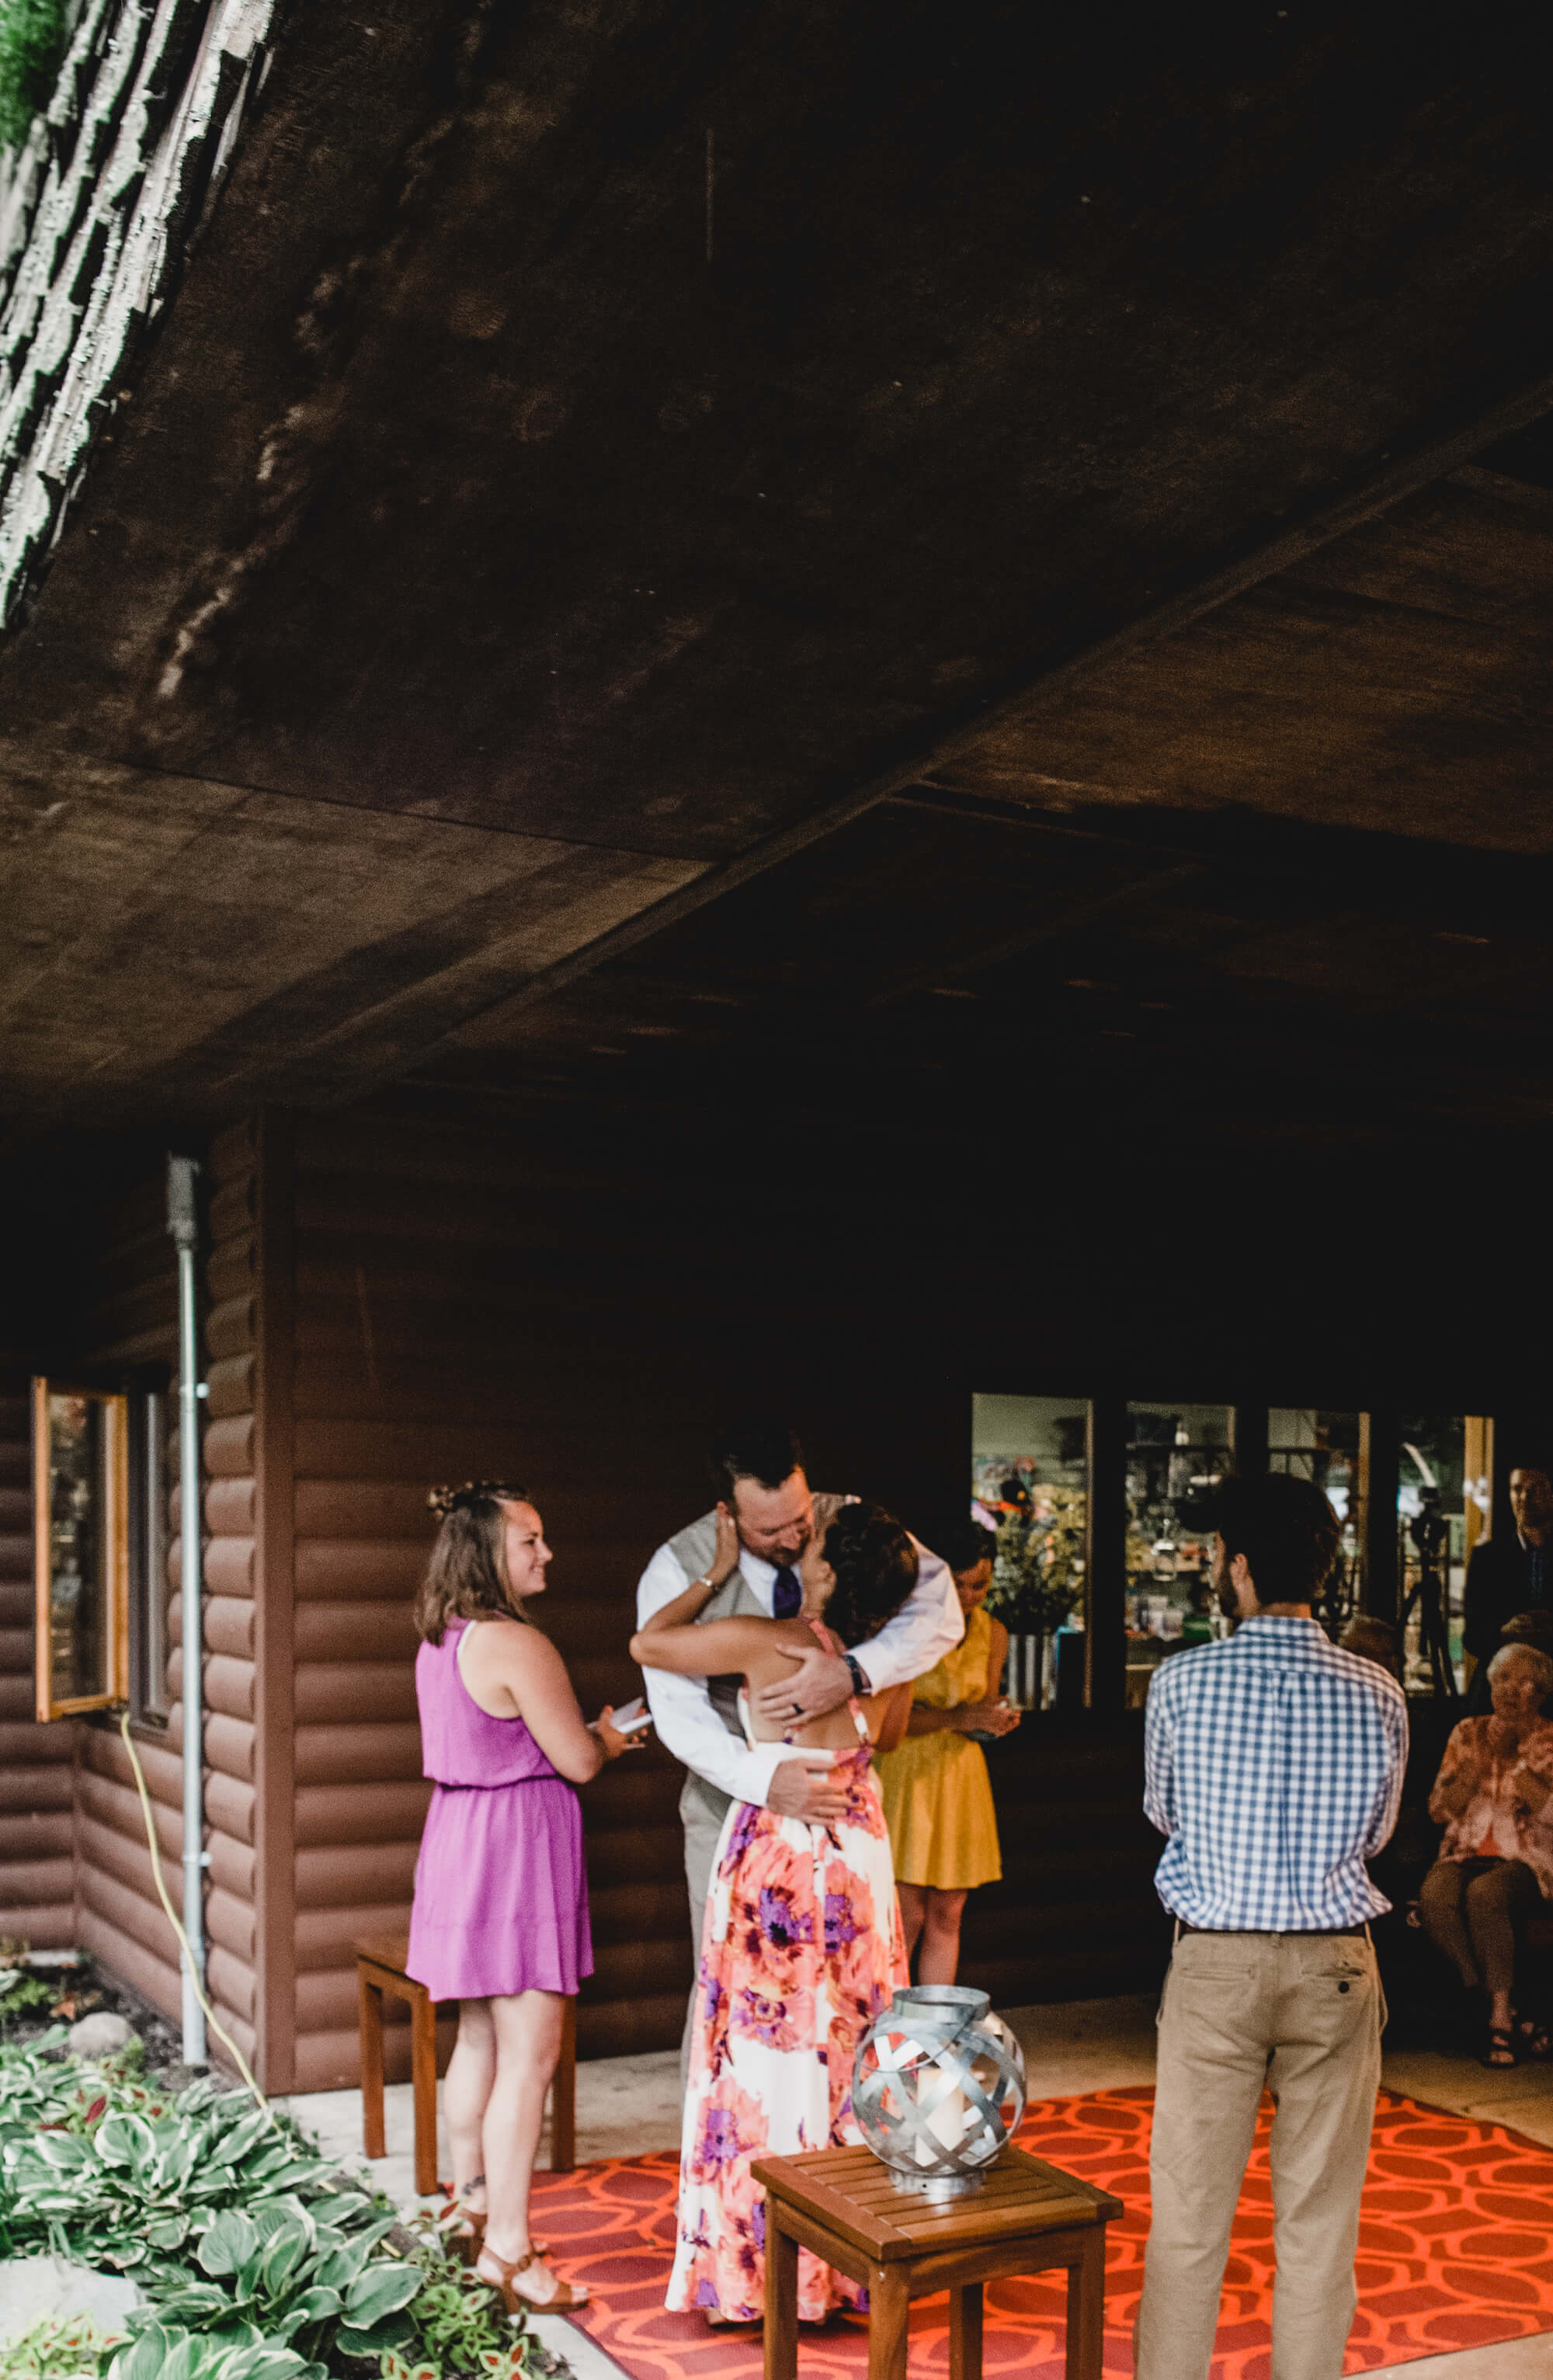 engle-olson-maddy-pat-mn-wedding-photography-25.jpg